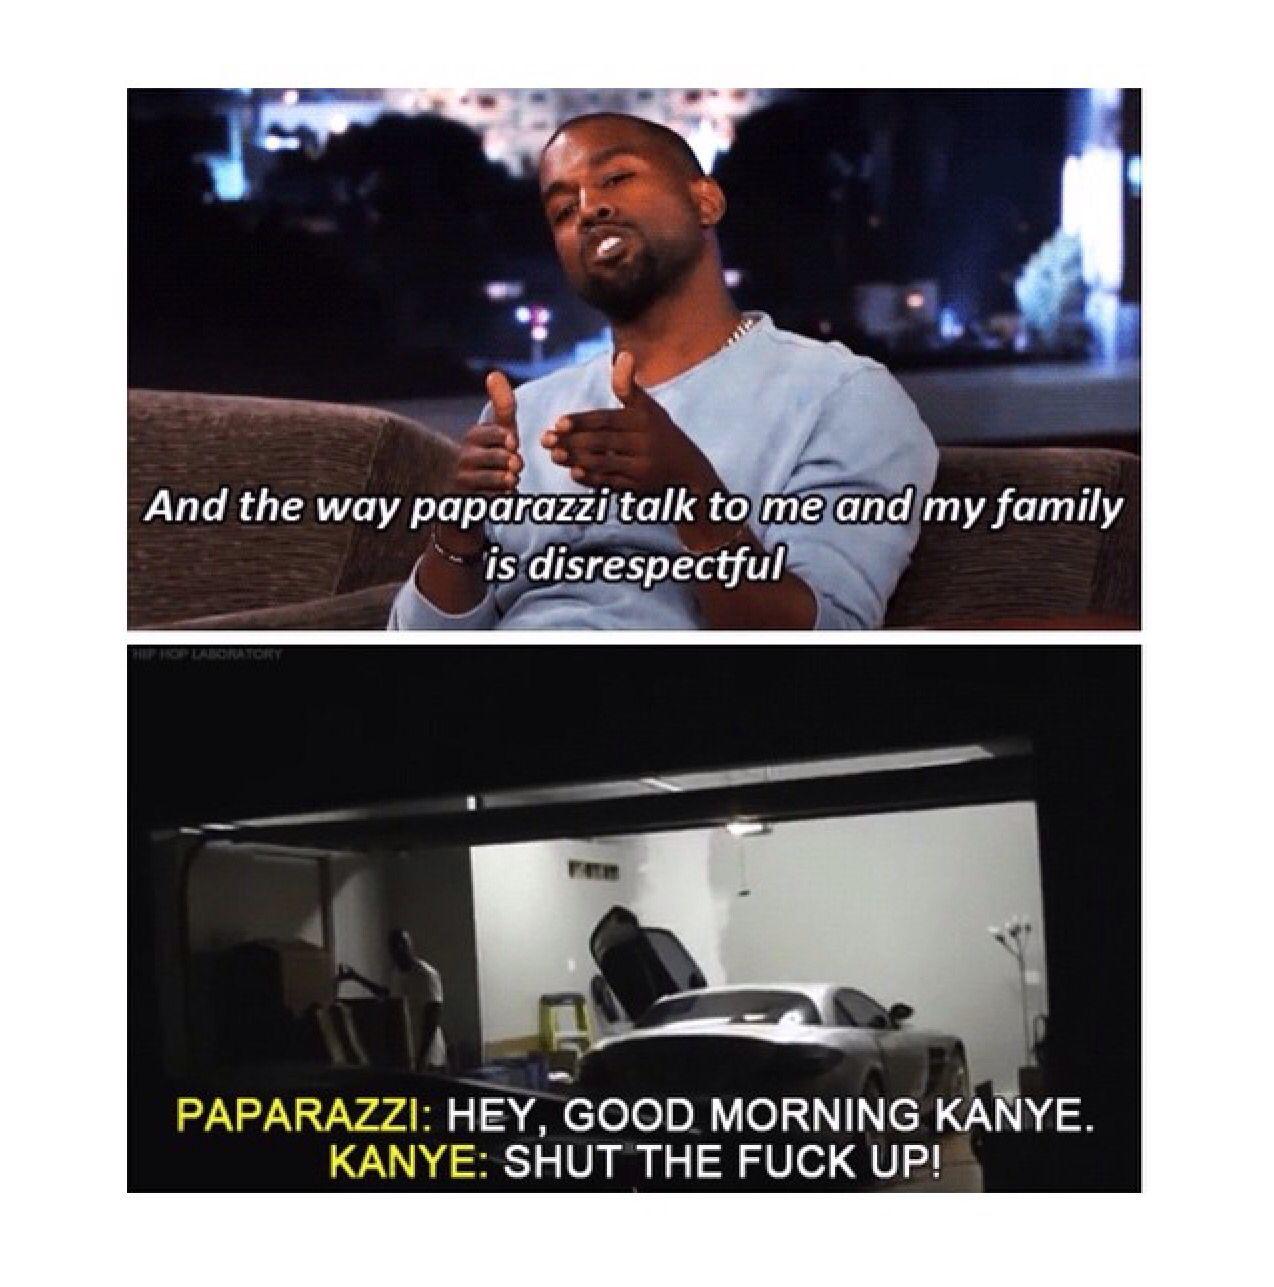 Ooh Ouch Kardashian Memes Funny Memes Memes